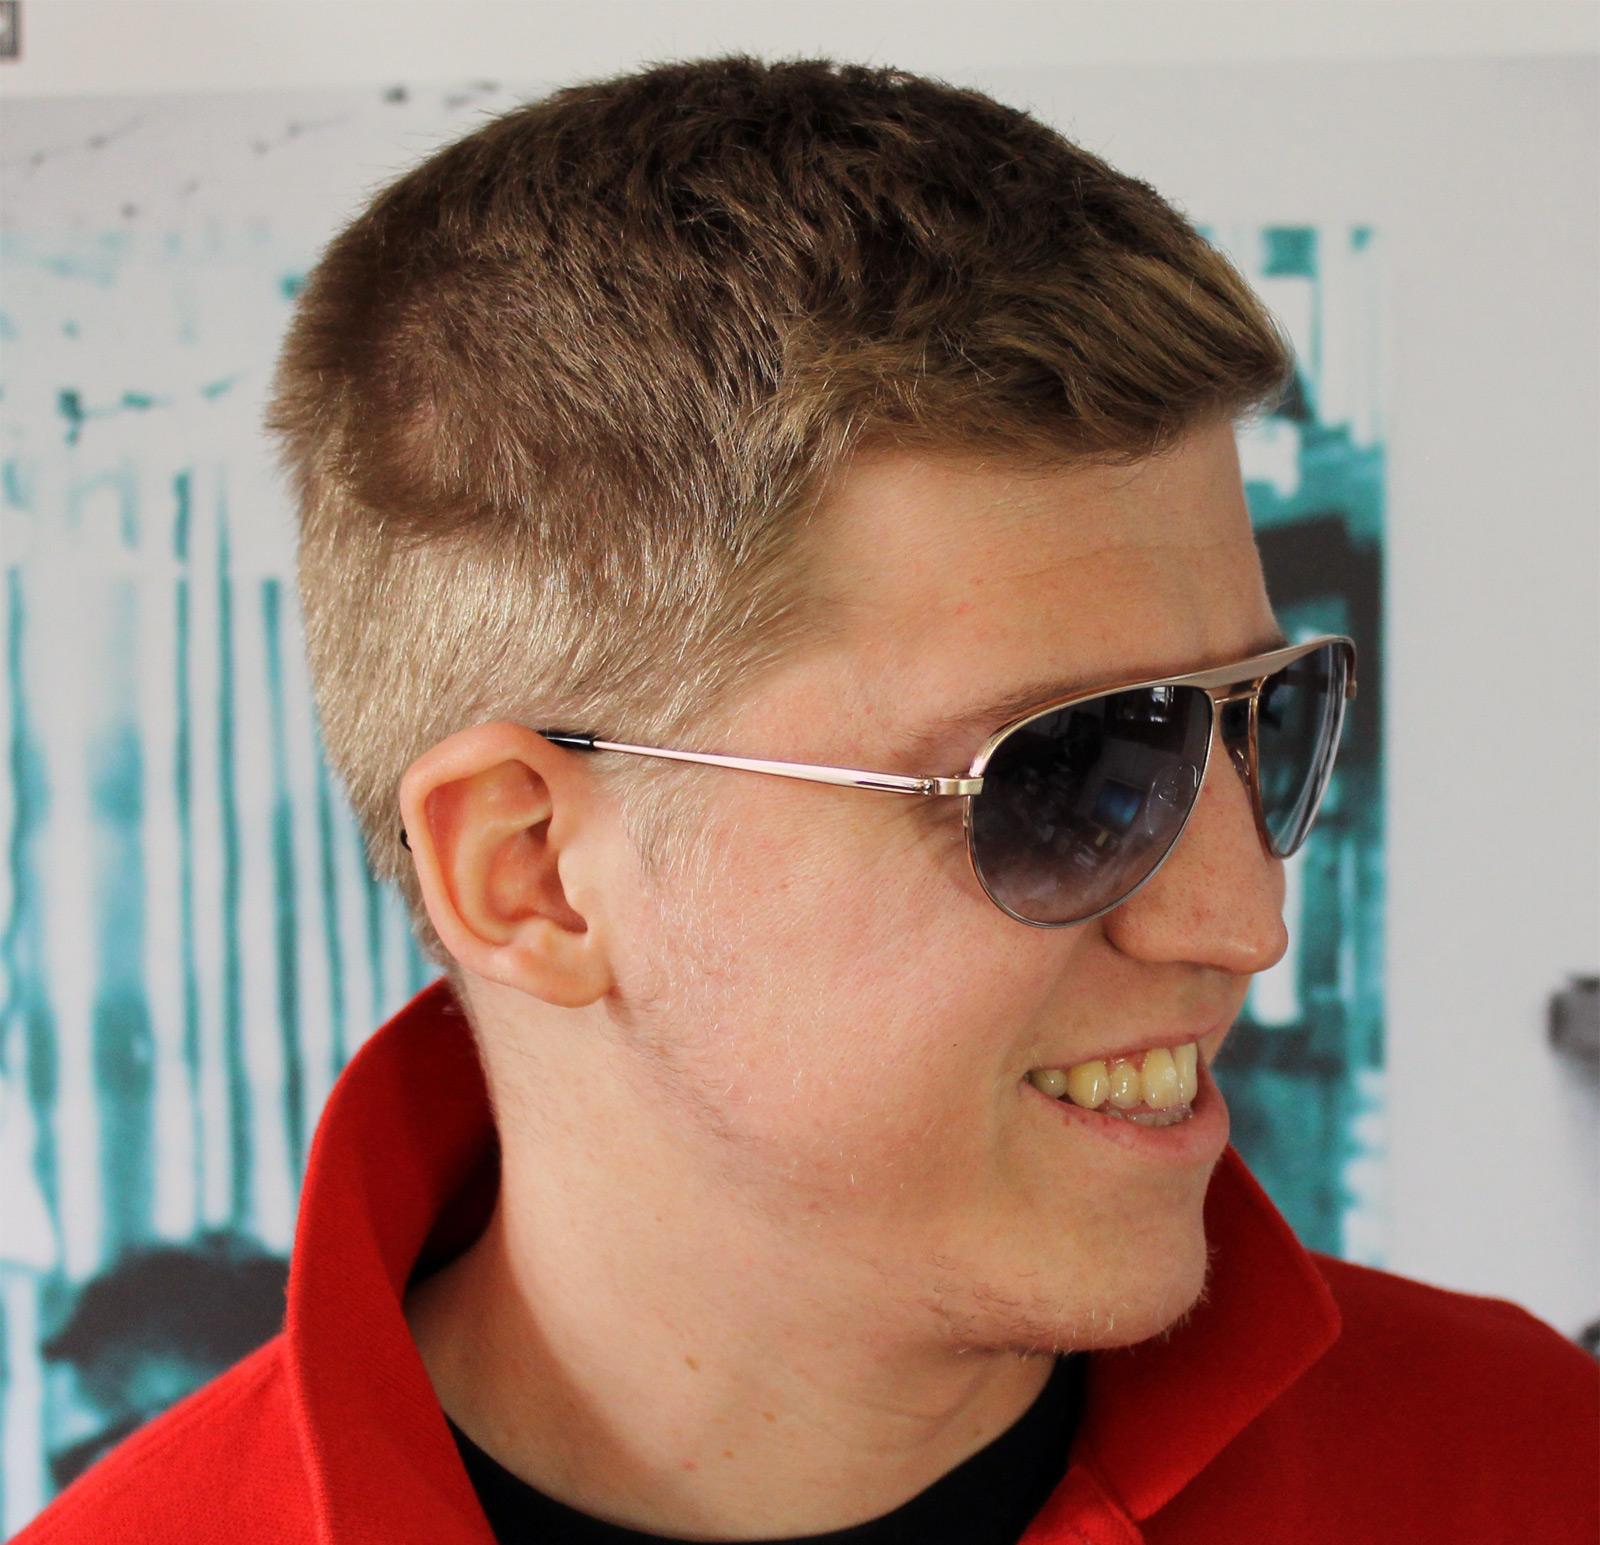 cd367499f3 Cheap Tom Ford 0207 William Sunglasses - Discounted Sunglasses